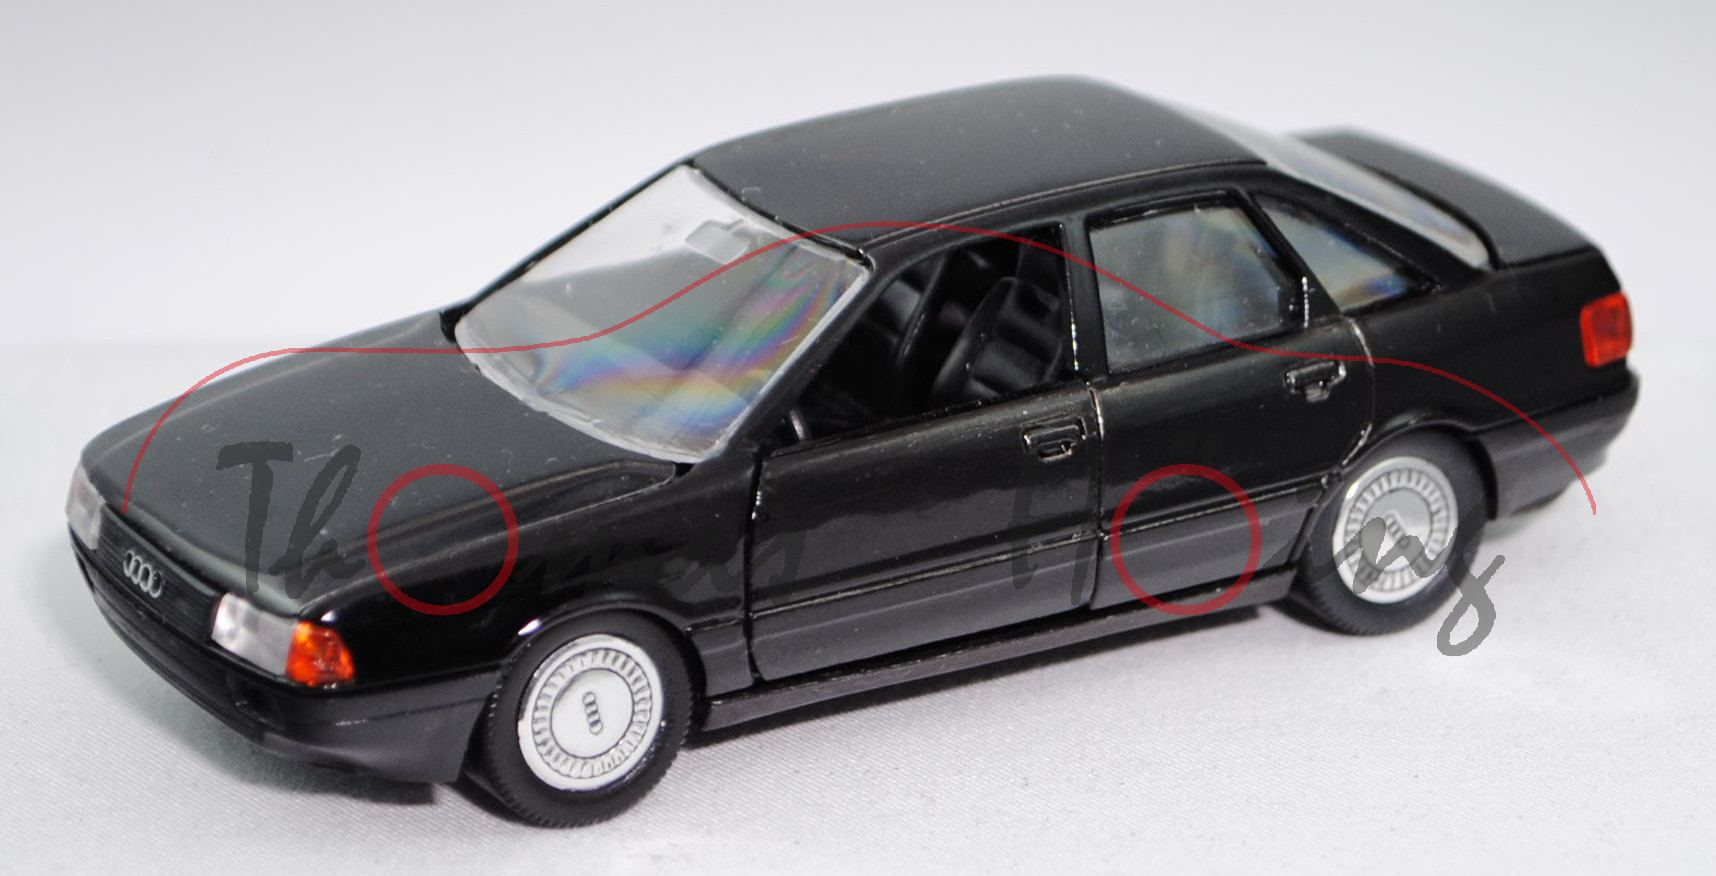 Audi 80 quattro (B3, Typ 89, Modell 1986-1991), schwarz ...